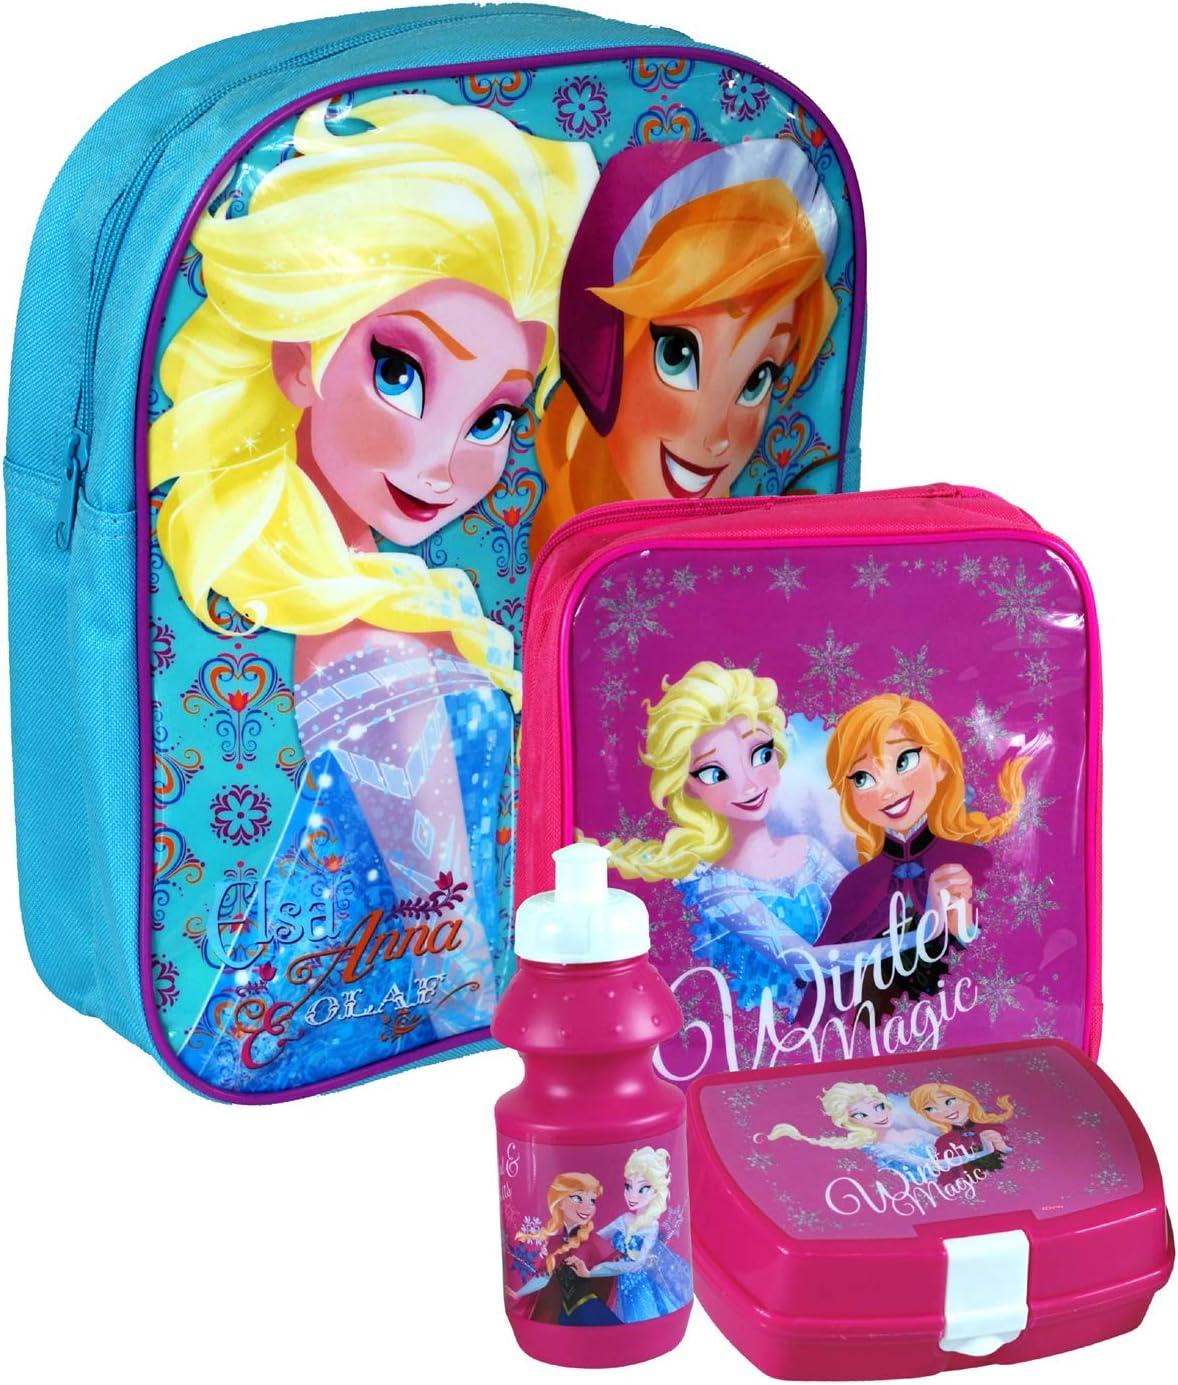 Box 8pc Girls Back to School Disney Lunch Bag Drinking Bottle /& Stationery Set